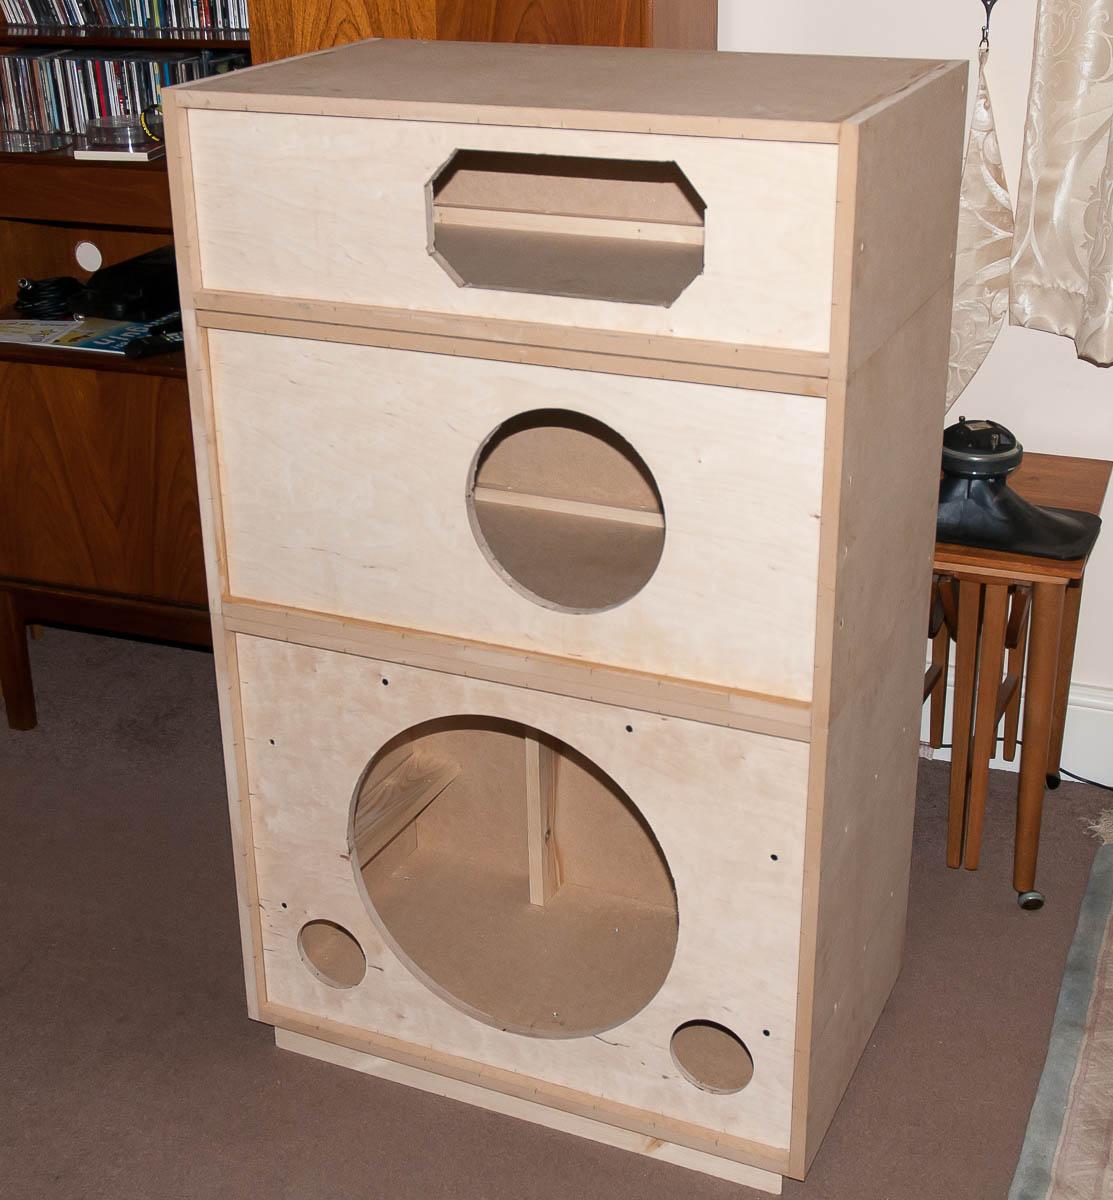 High Efficiency Speaker Project - Part 3 - Teribil Audio